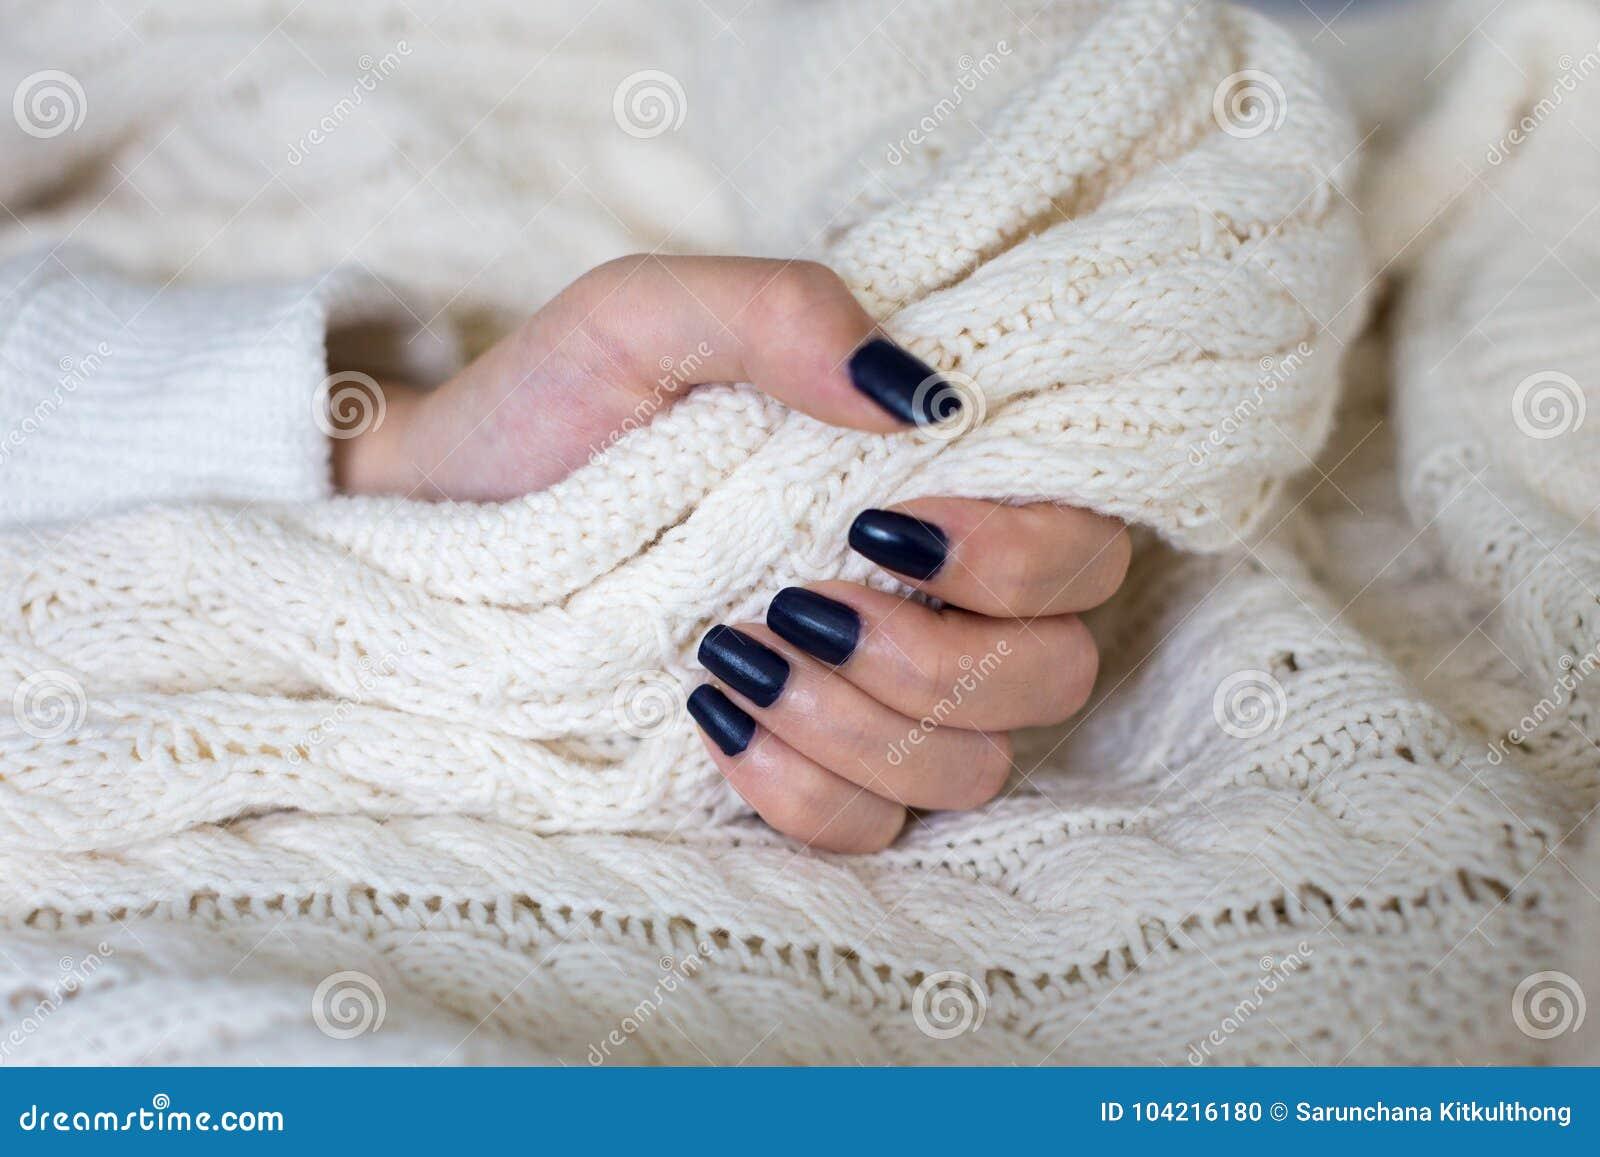 Beautiful Female Hand With Dark Blue Nail Polish Design Stock Photo